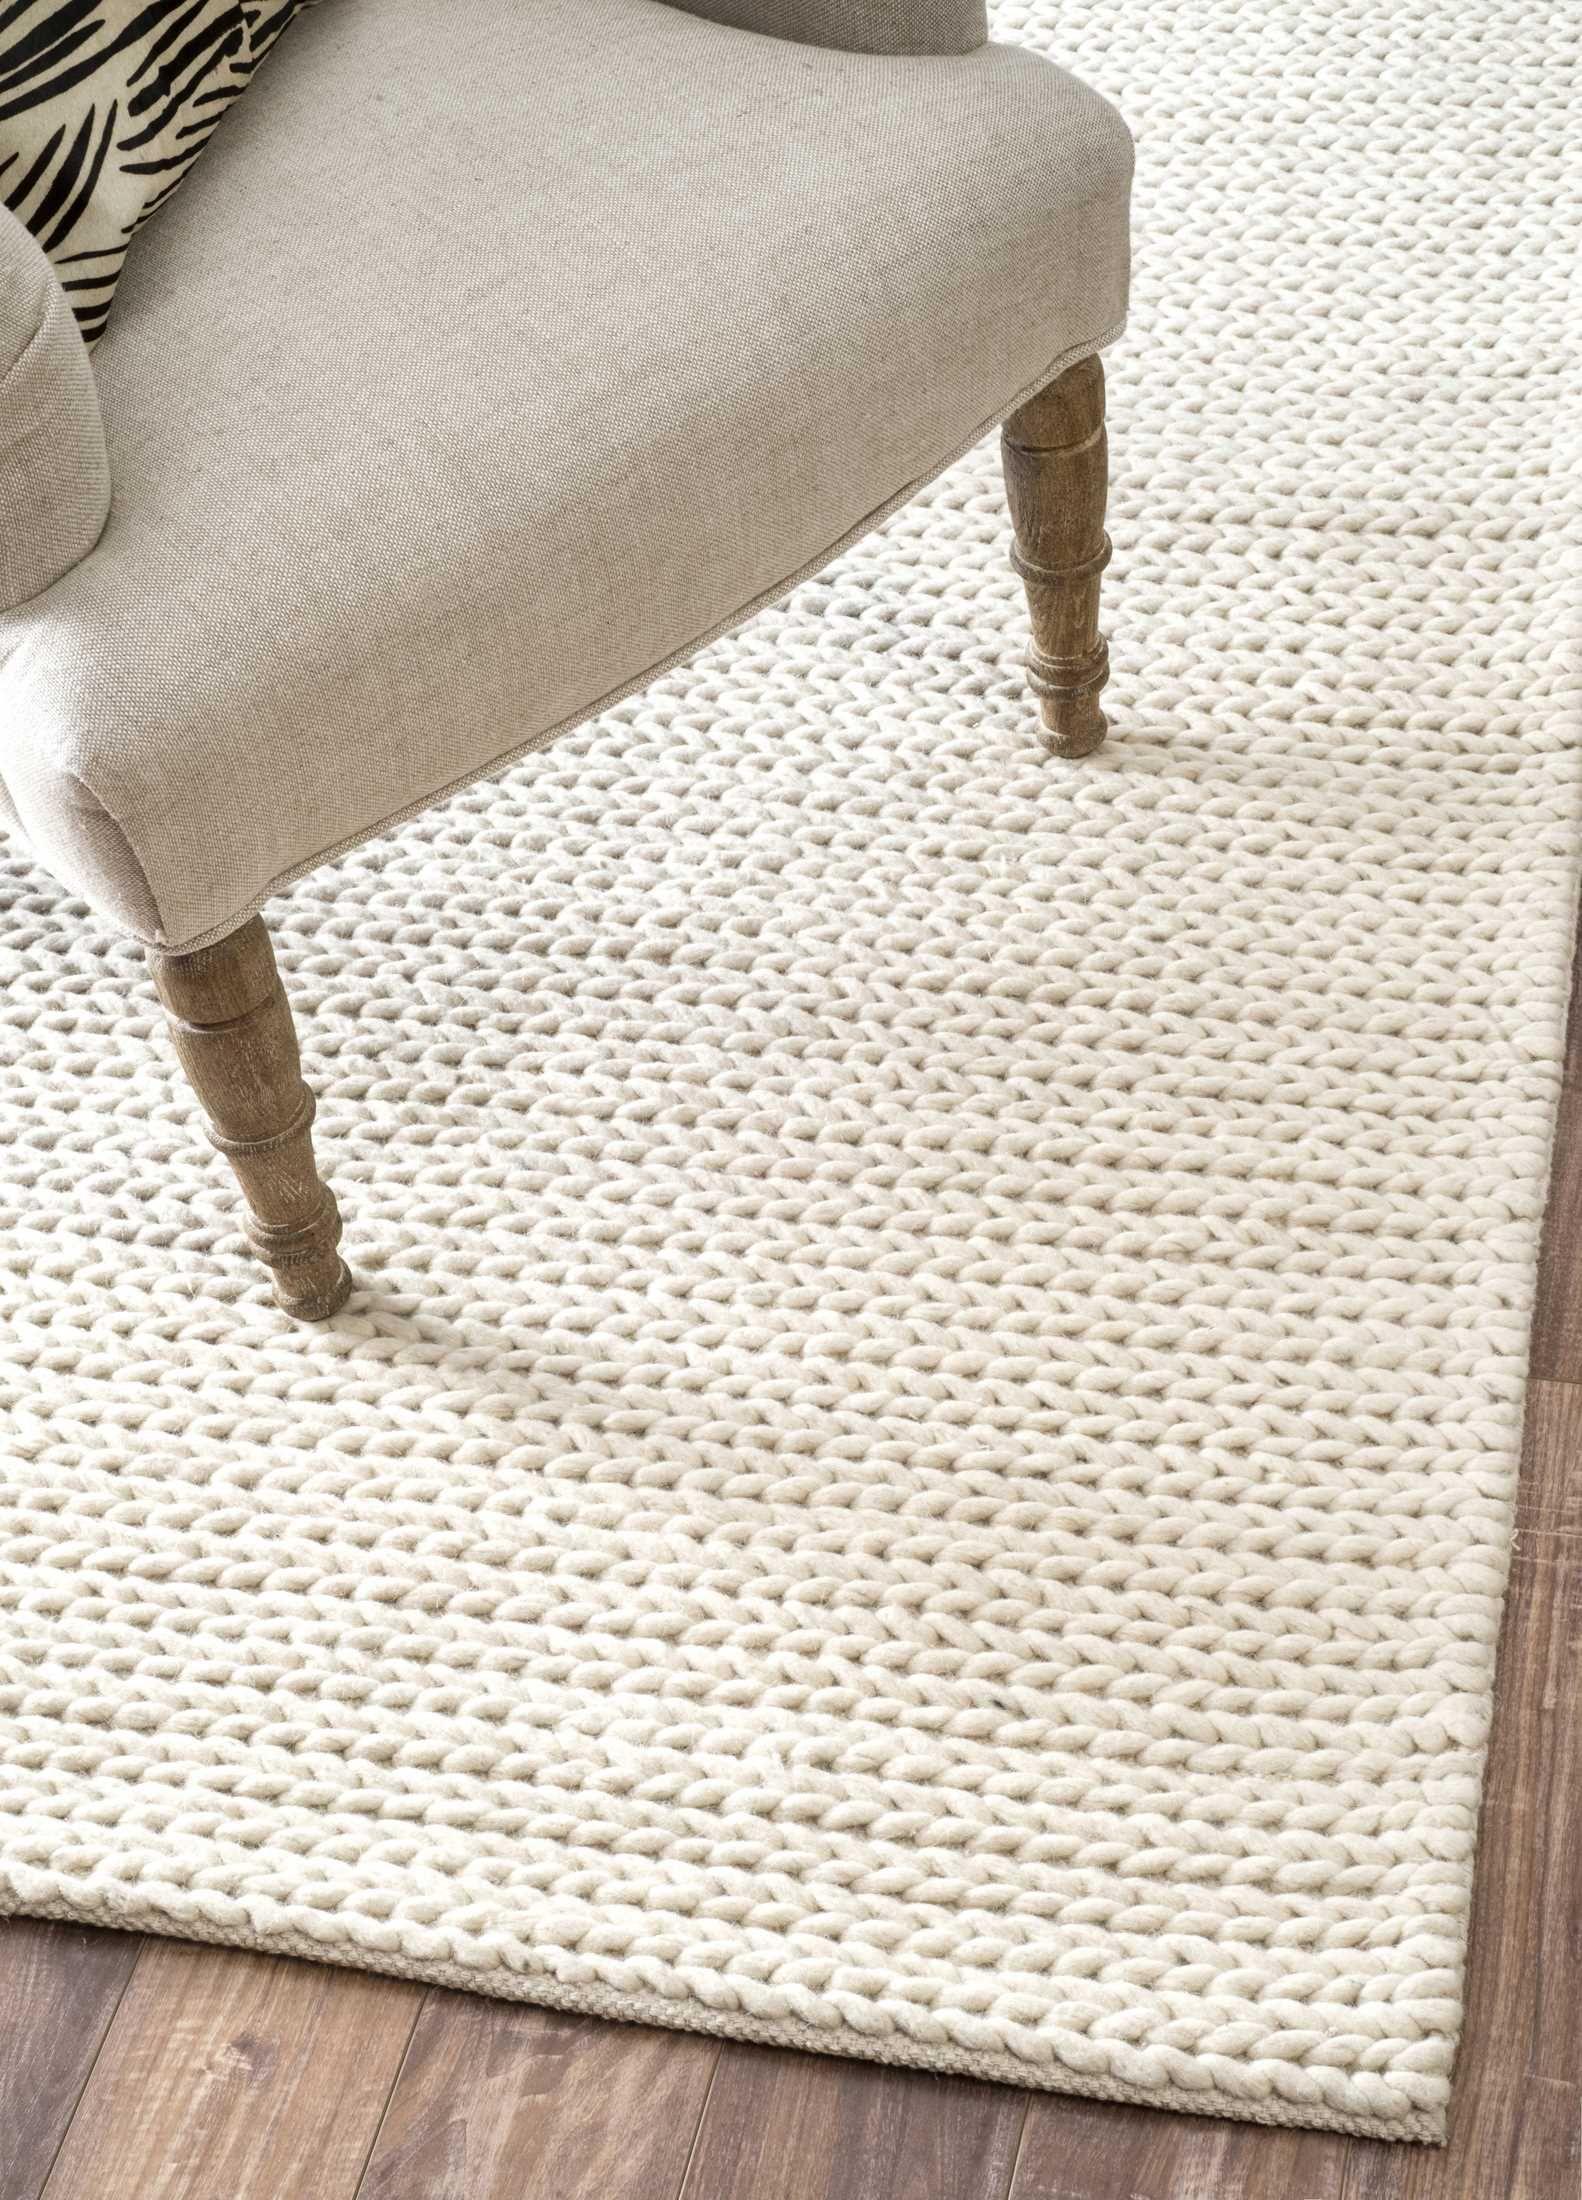 best 25 nursery rugs ideas on pinterest beige childrens rugs white nursery and simple baby nursery